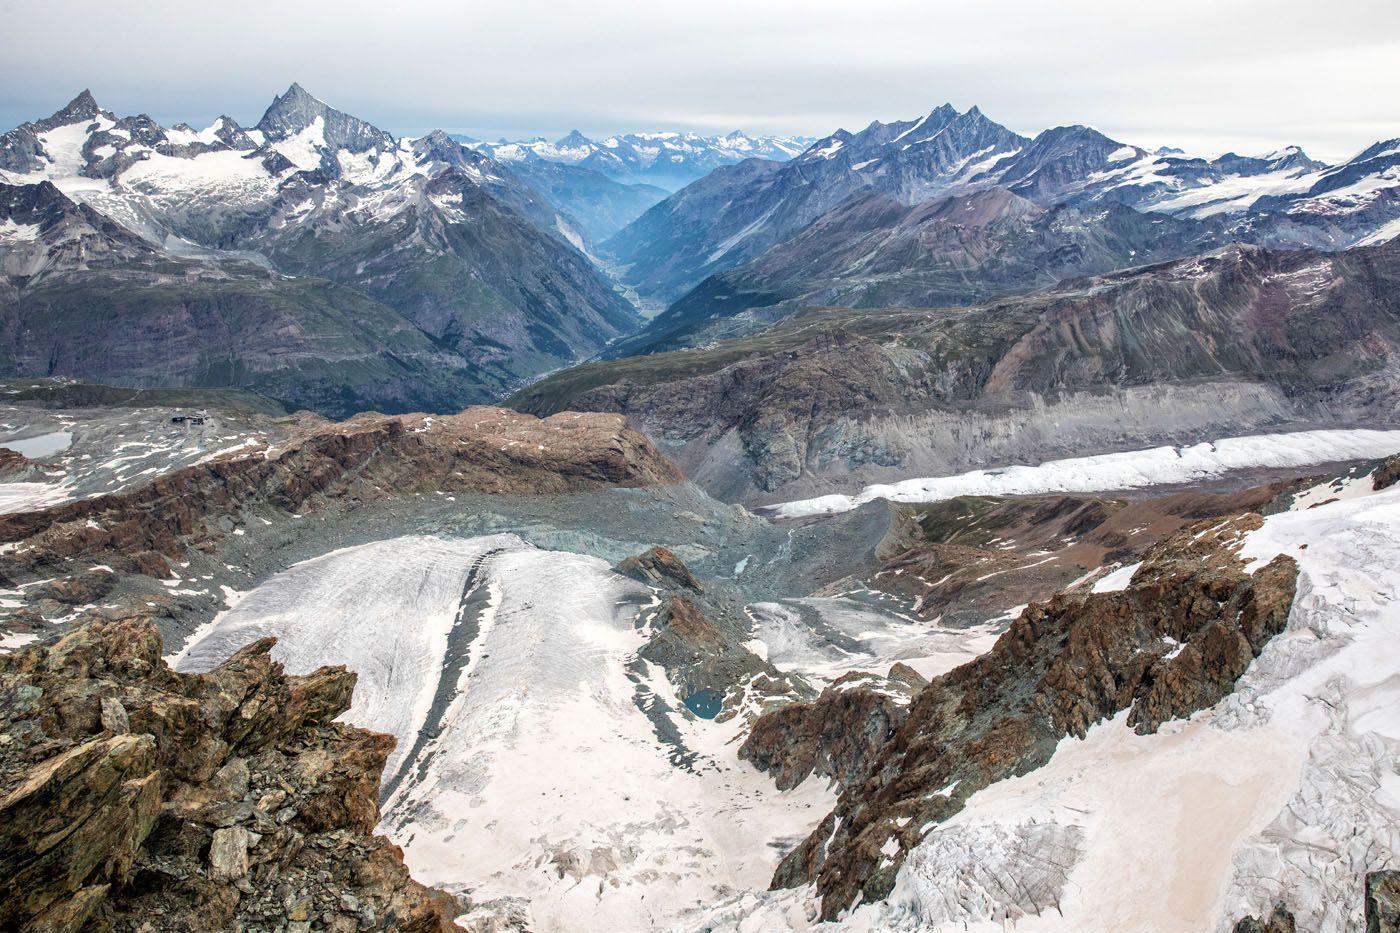 View Matterhorn Glacier Paradise